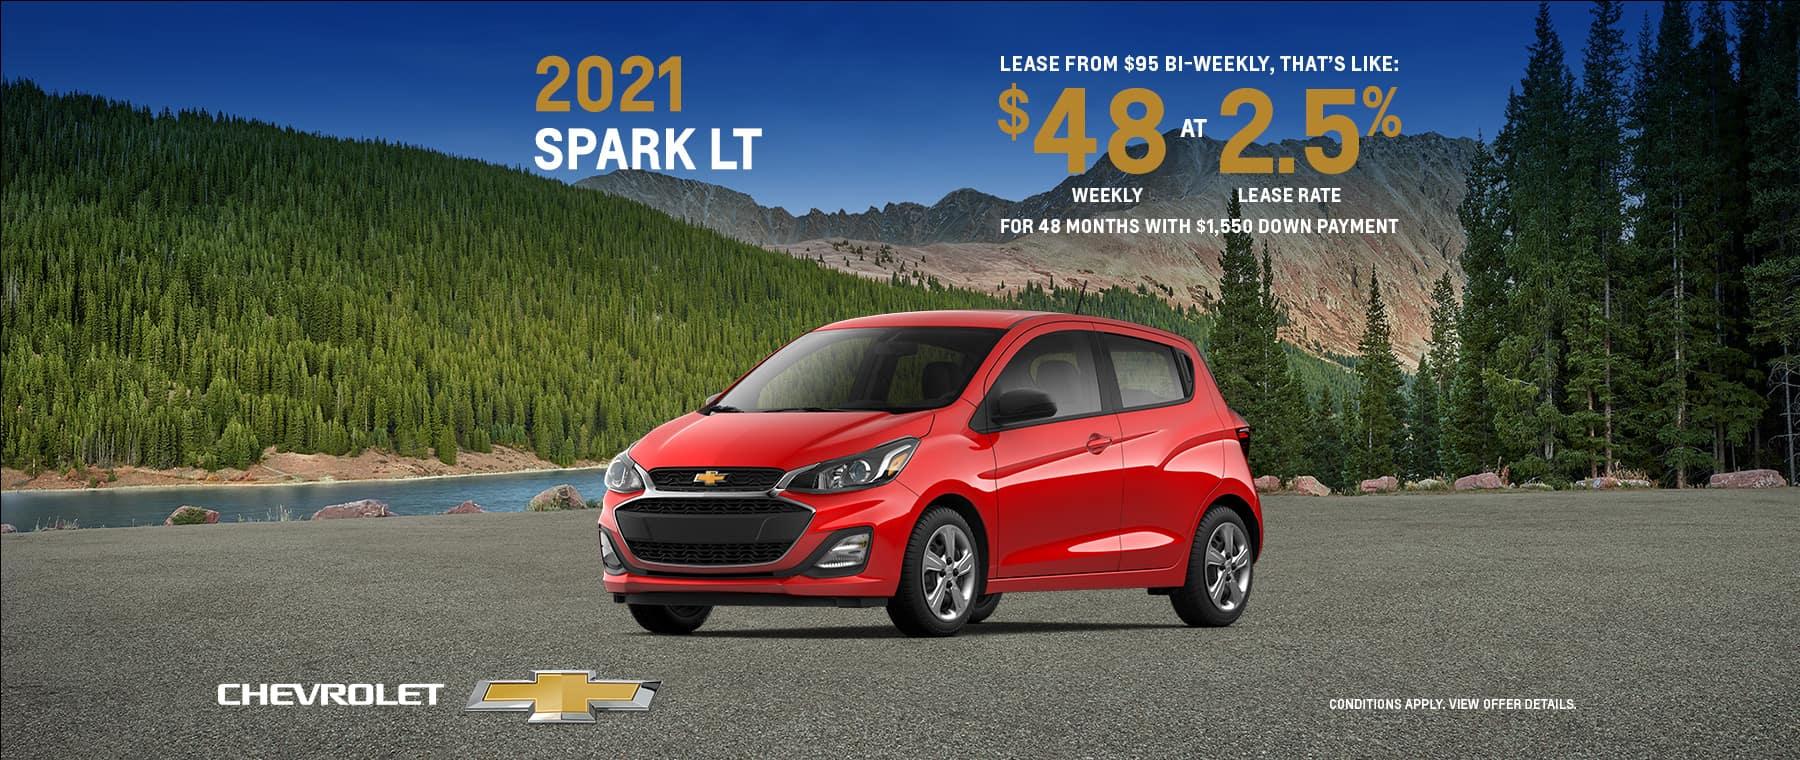 2021_JUNE_WST_Chevy_T3_EN_1800x760_CAR-SUV_SPARK